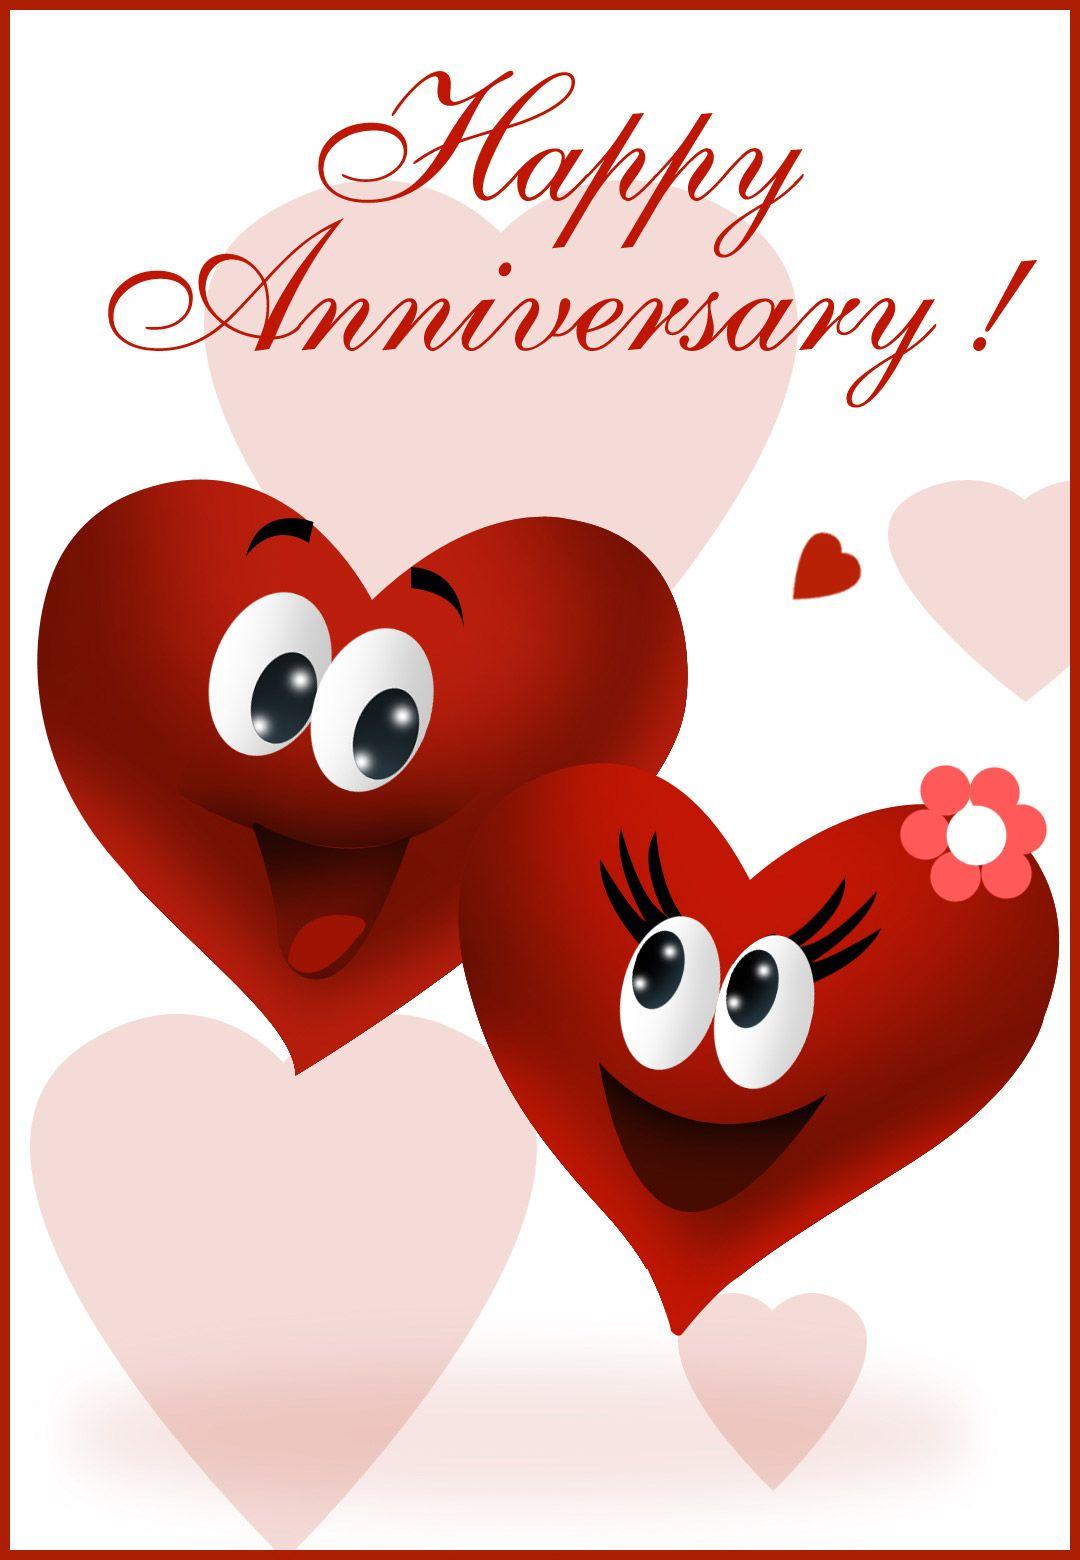 Free Printable Happy Anniversary Greeting Card | Anniversary - Free Printable Anniversary Cards